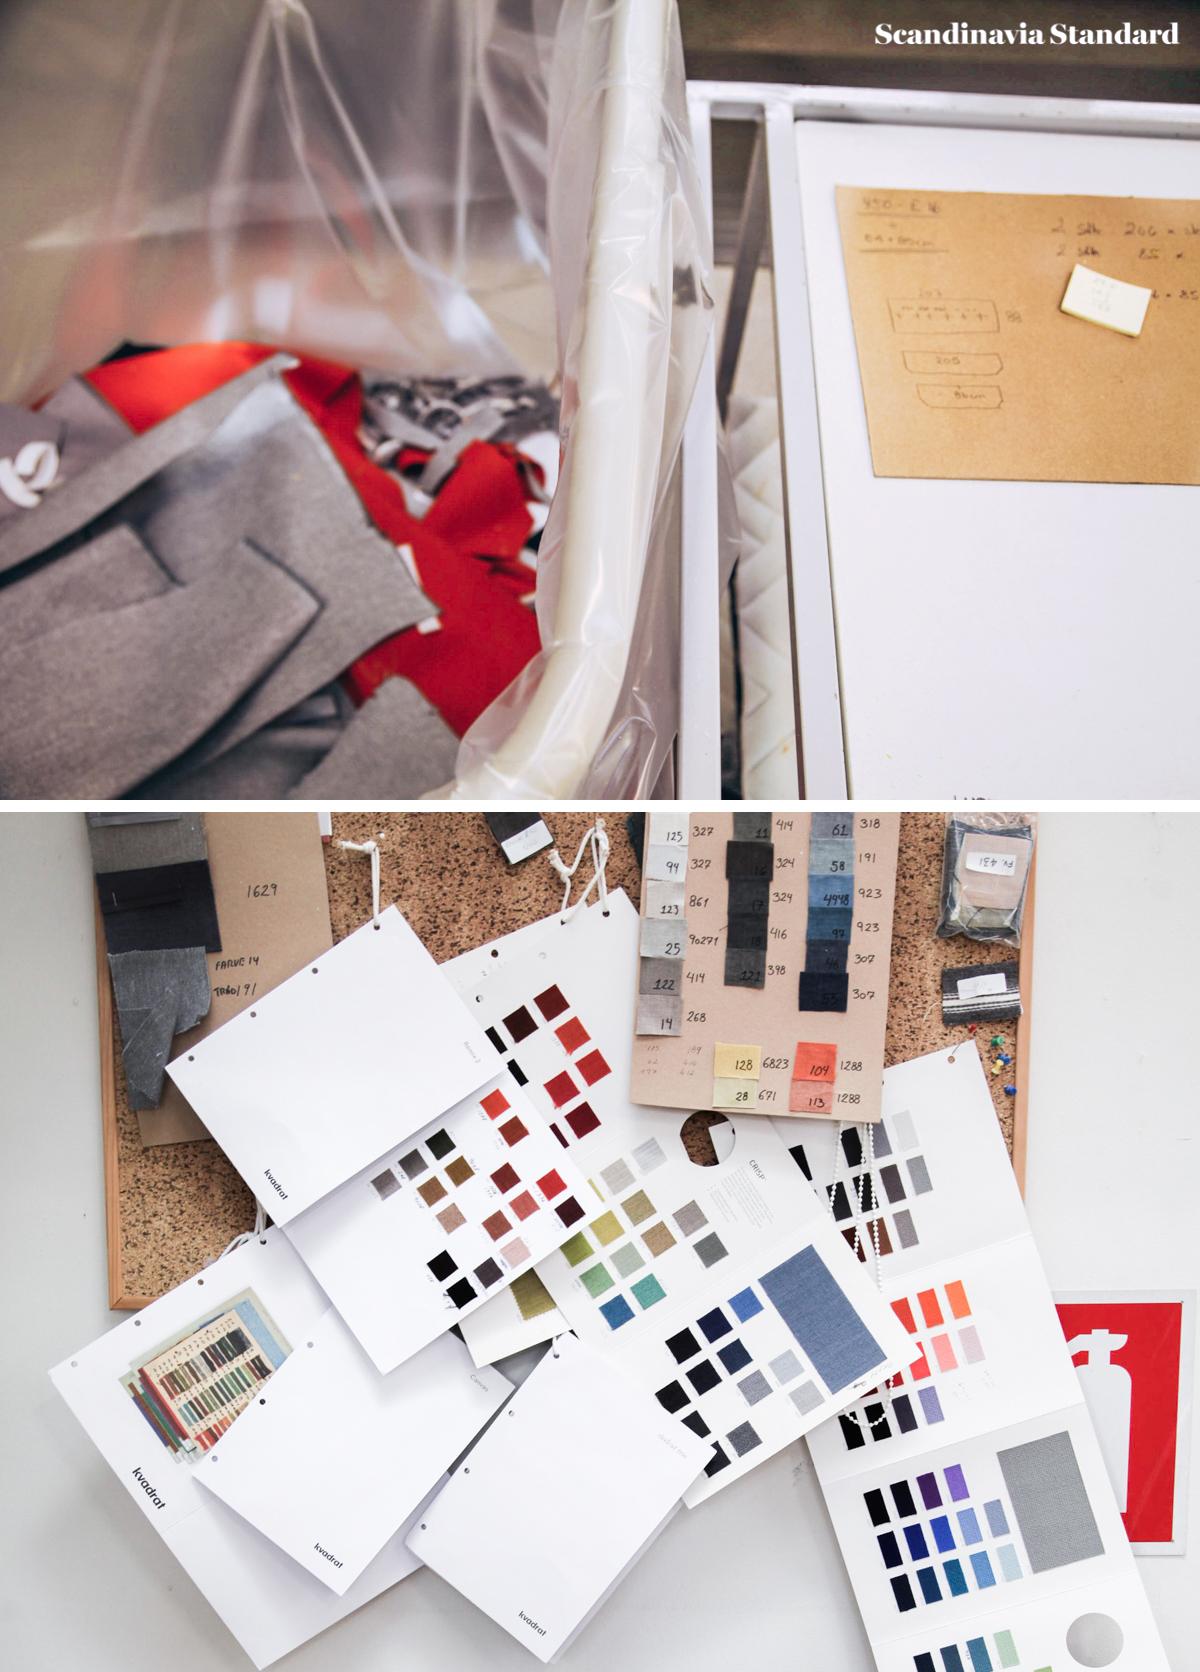 Collage Design Erik Jorgensen Delphi Sofa | Scandinavia Standard